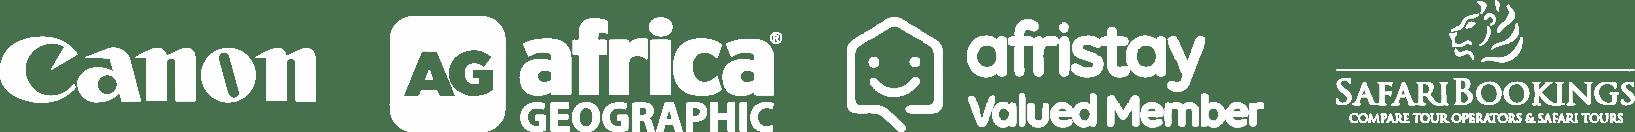 rhulani safaris partner logo 5